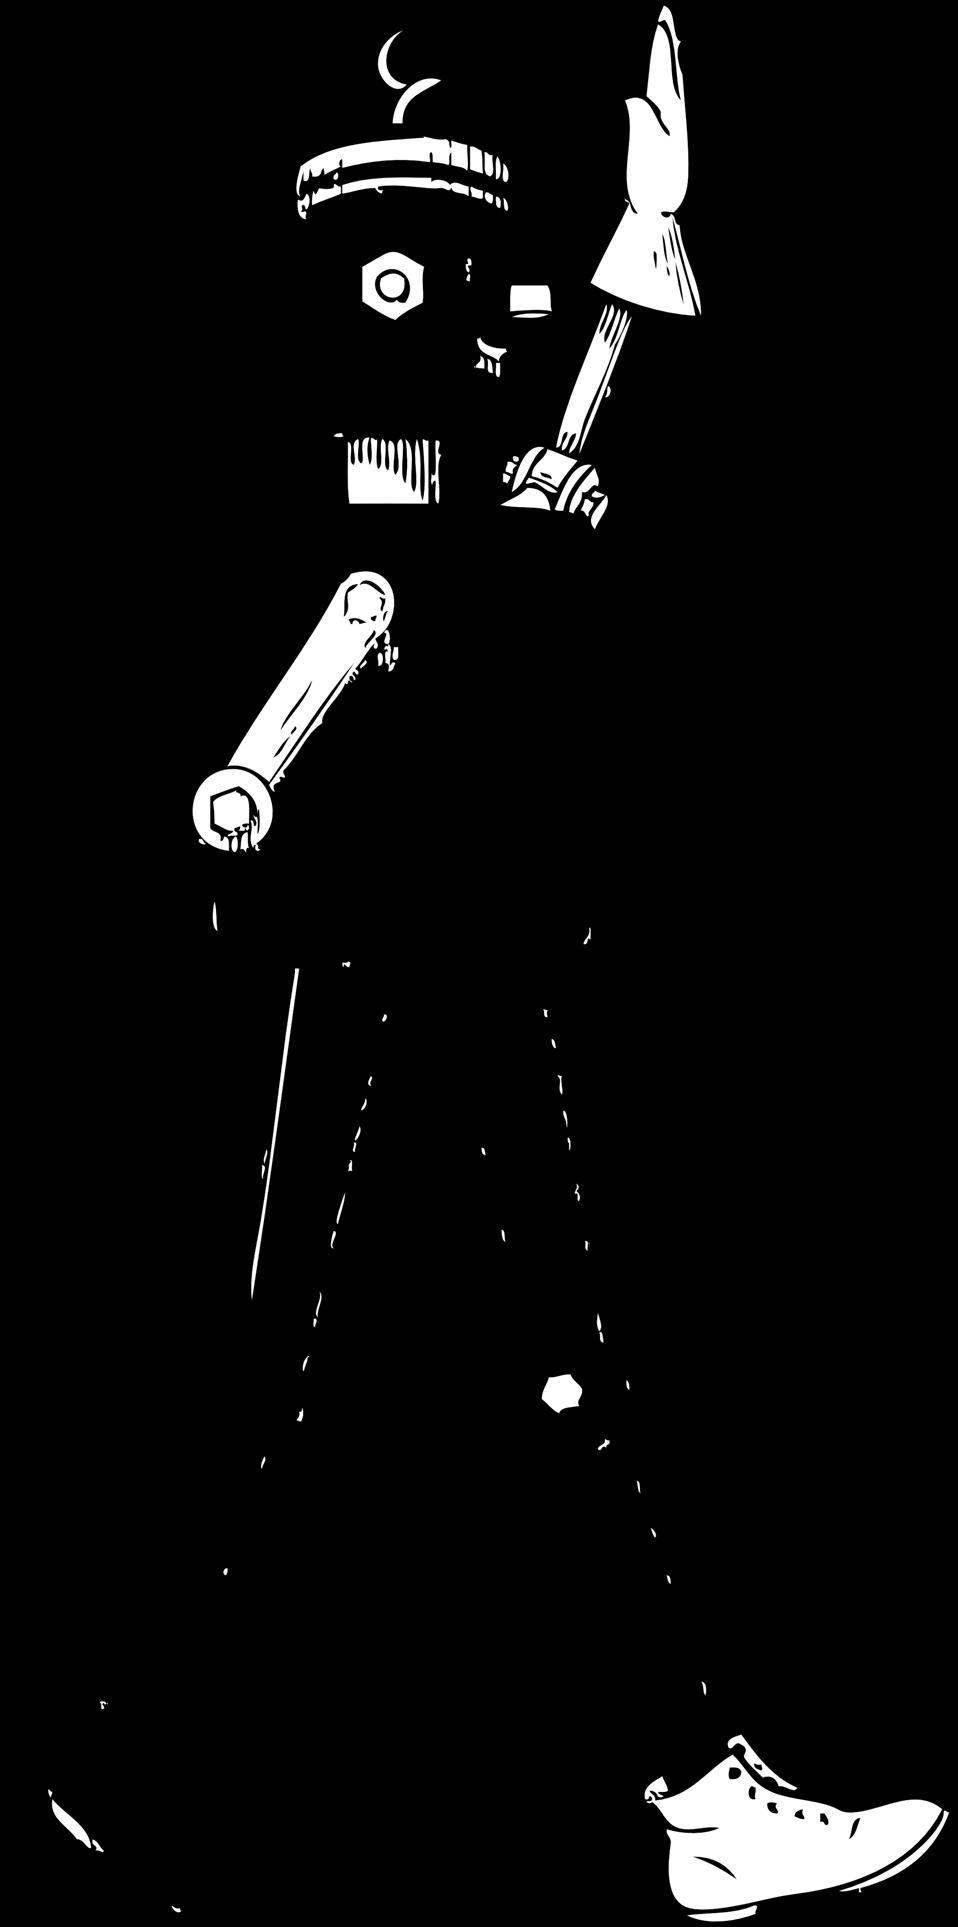 mechanical man side view